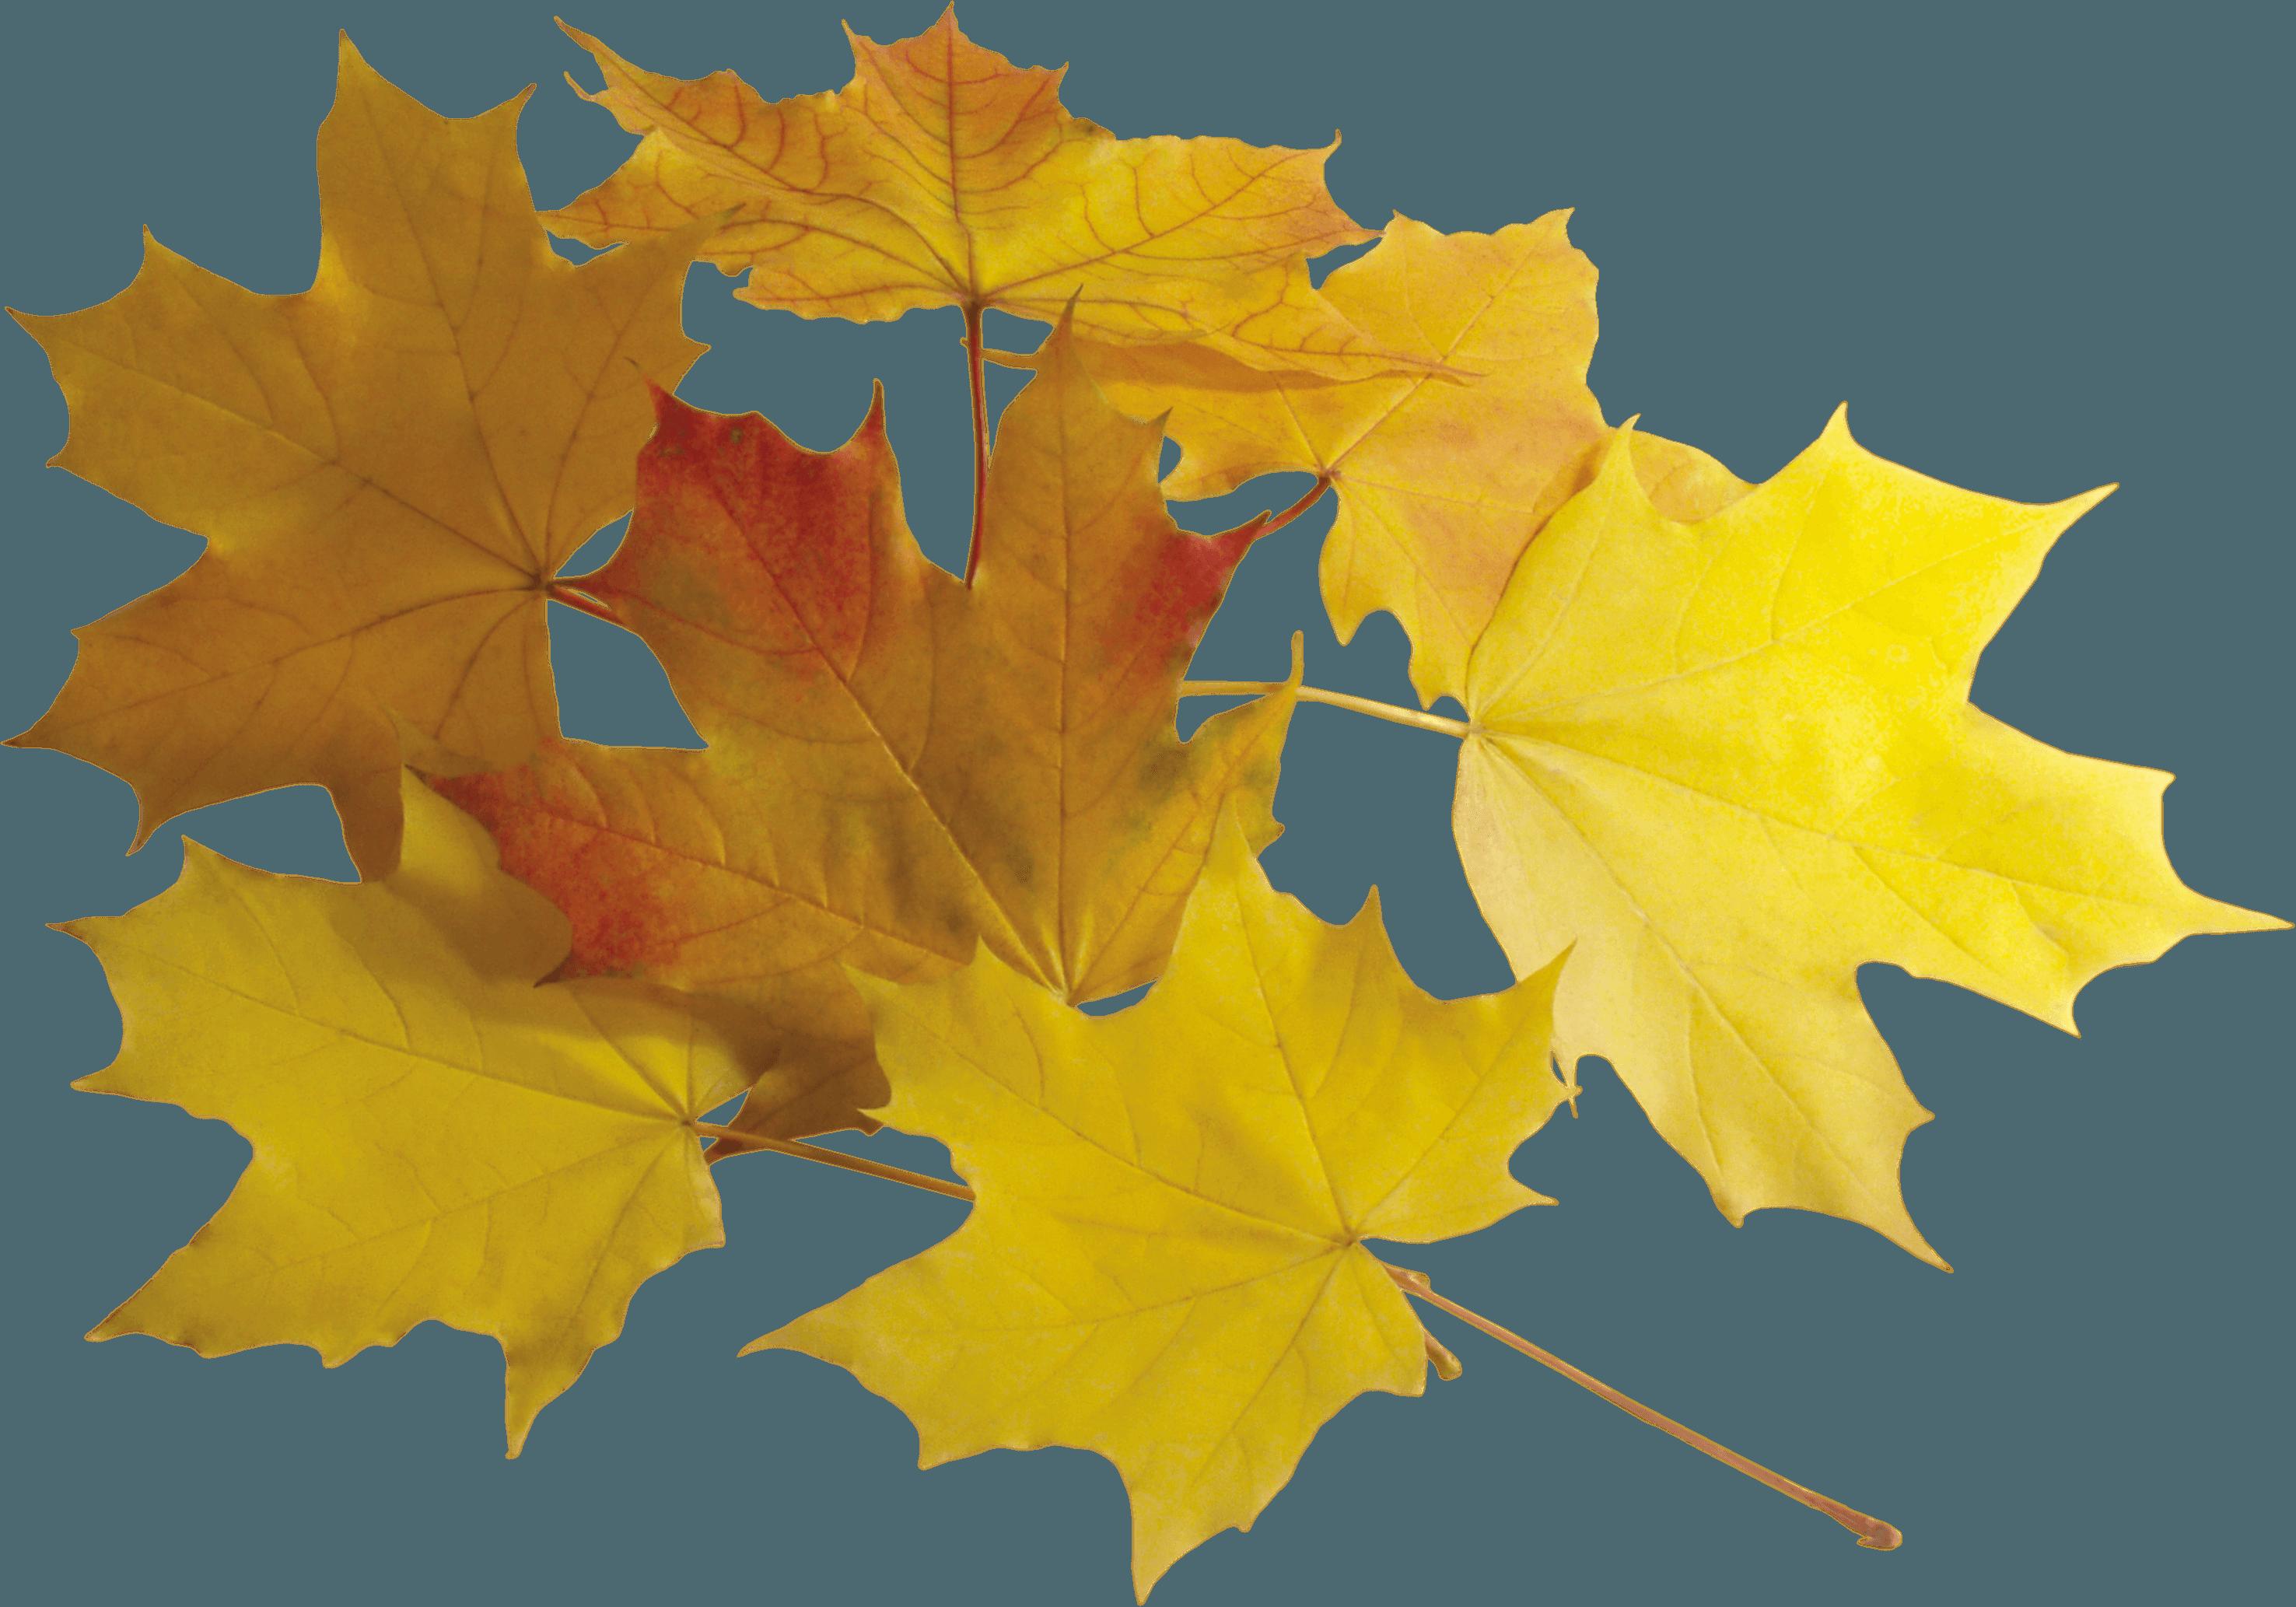 Download Autumn Png Leaves HQ PNG Image   FreePNGImg